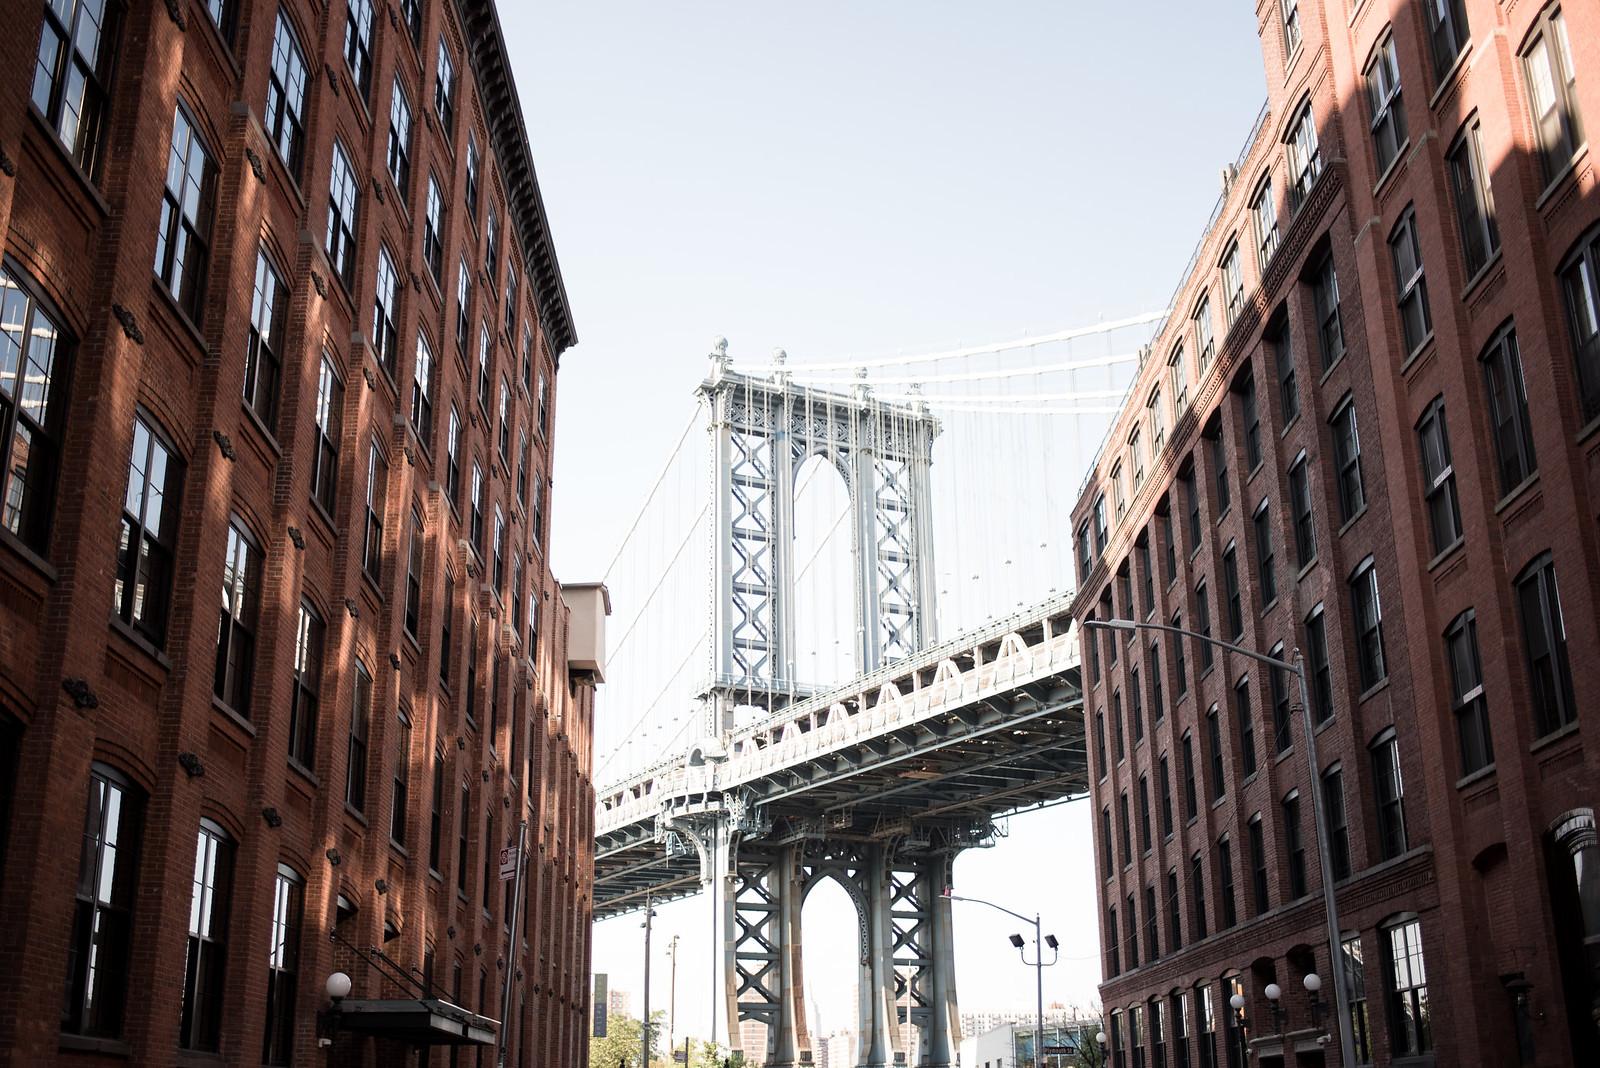 Under the Manhattan Bridge in Brooklyn on juliettelaura.blogspot.com